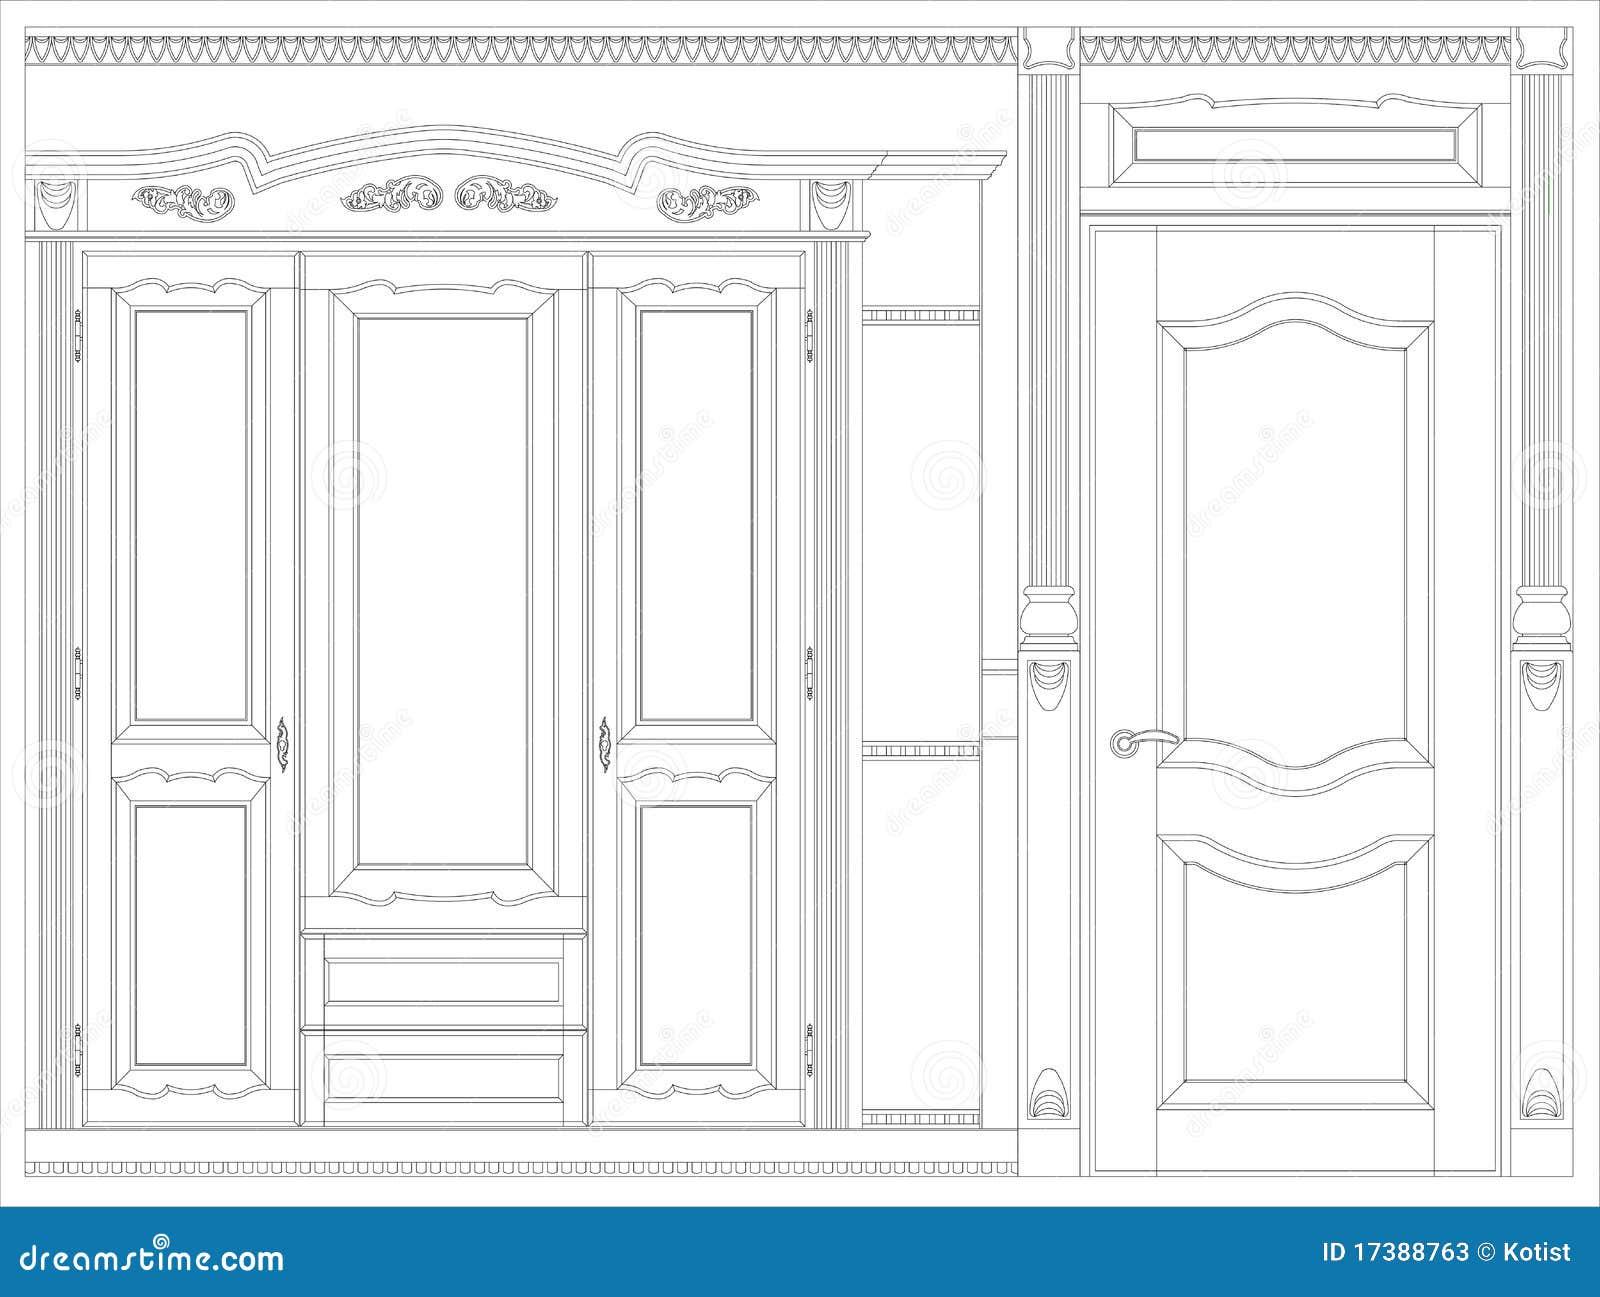 Woodwork furniture blueprints pdf plans furniture blueprints malvernweather Image collections